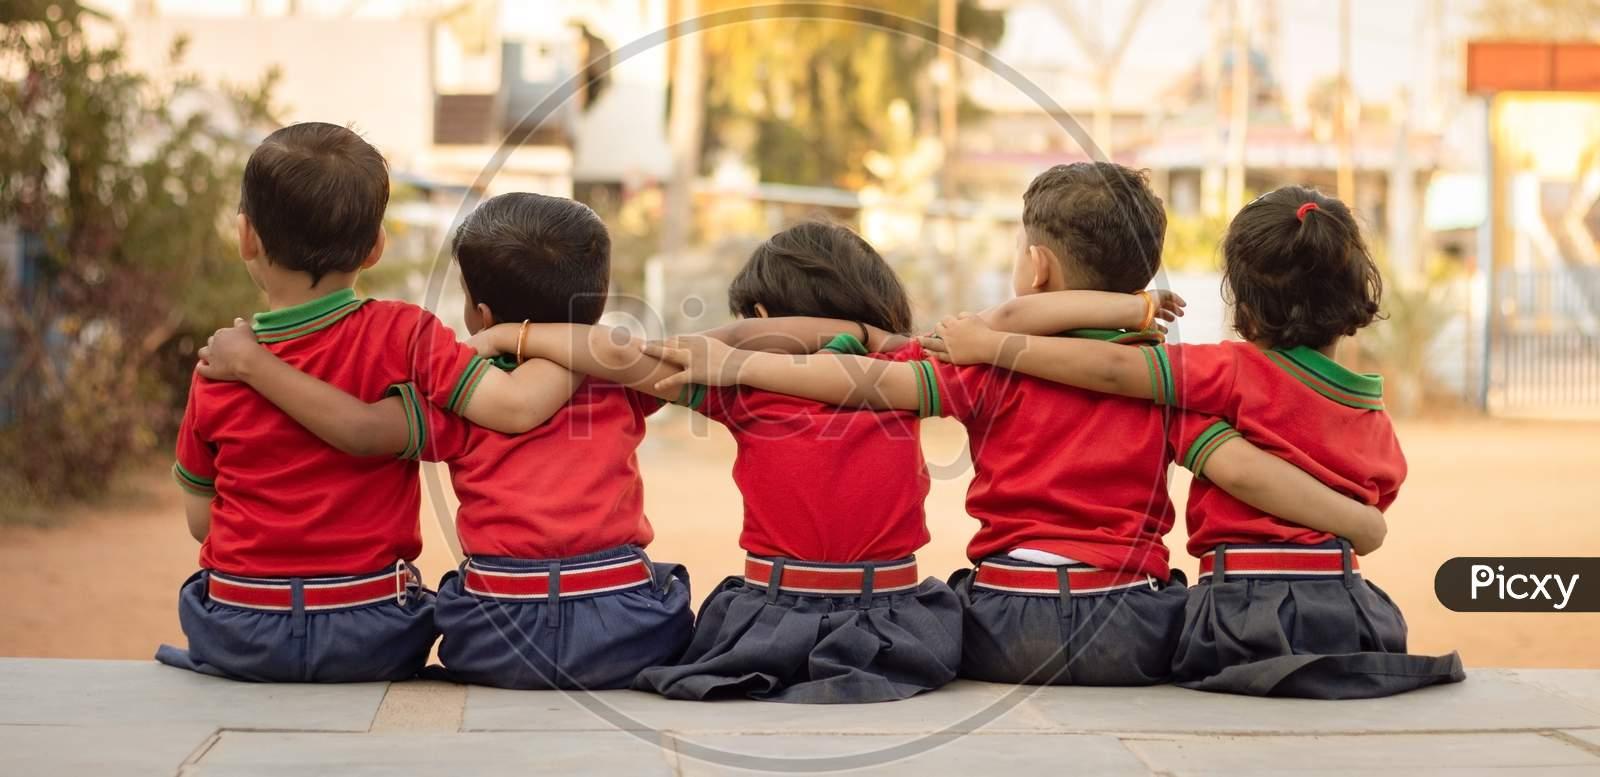 Back View, Group Of Kindergarten Kids Friends Arm Around Sitting Together